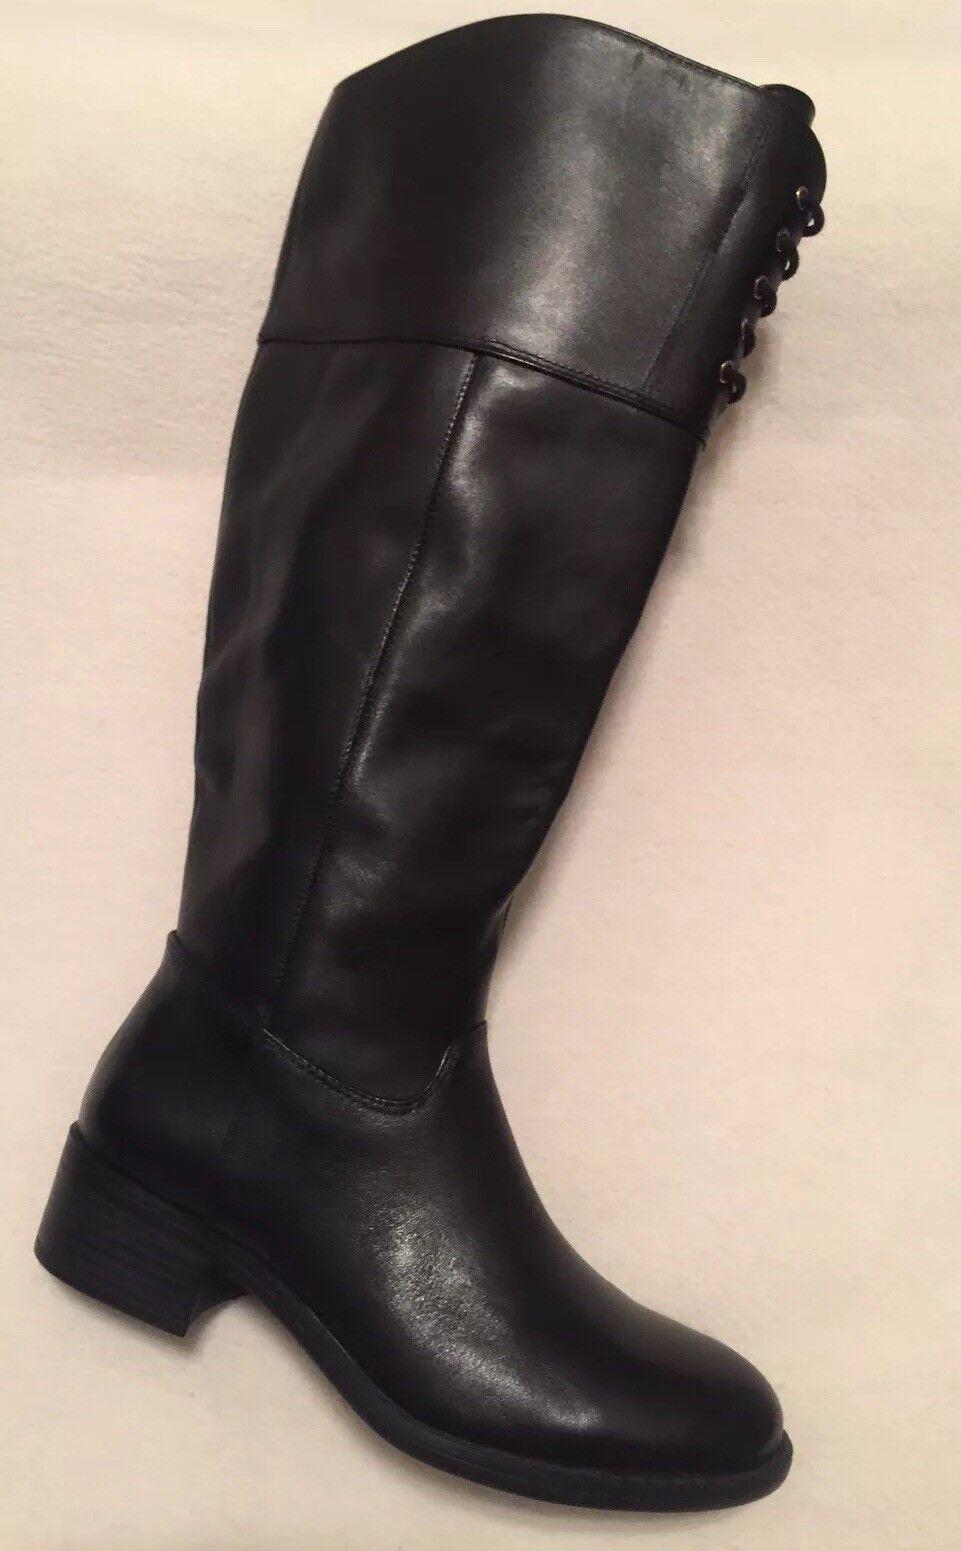 New Isaac Mizrahi Leslie Black Leather Tall Boots Wide Calf sz 5M